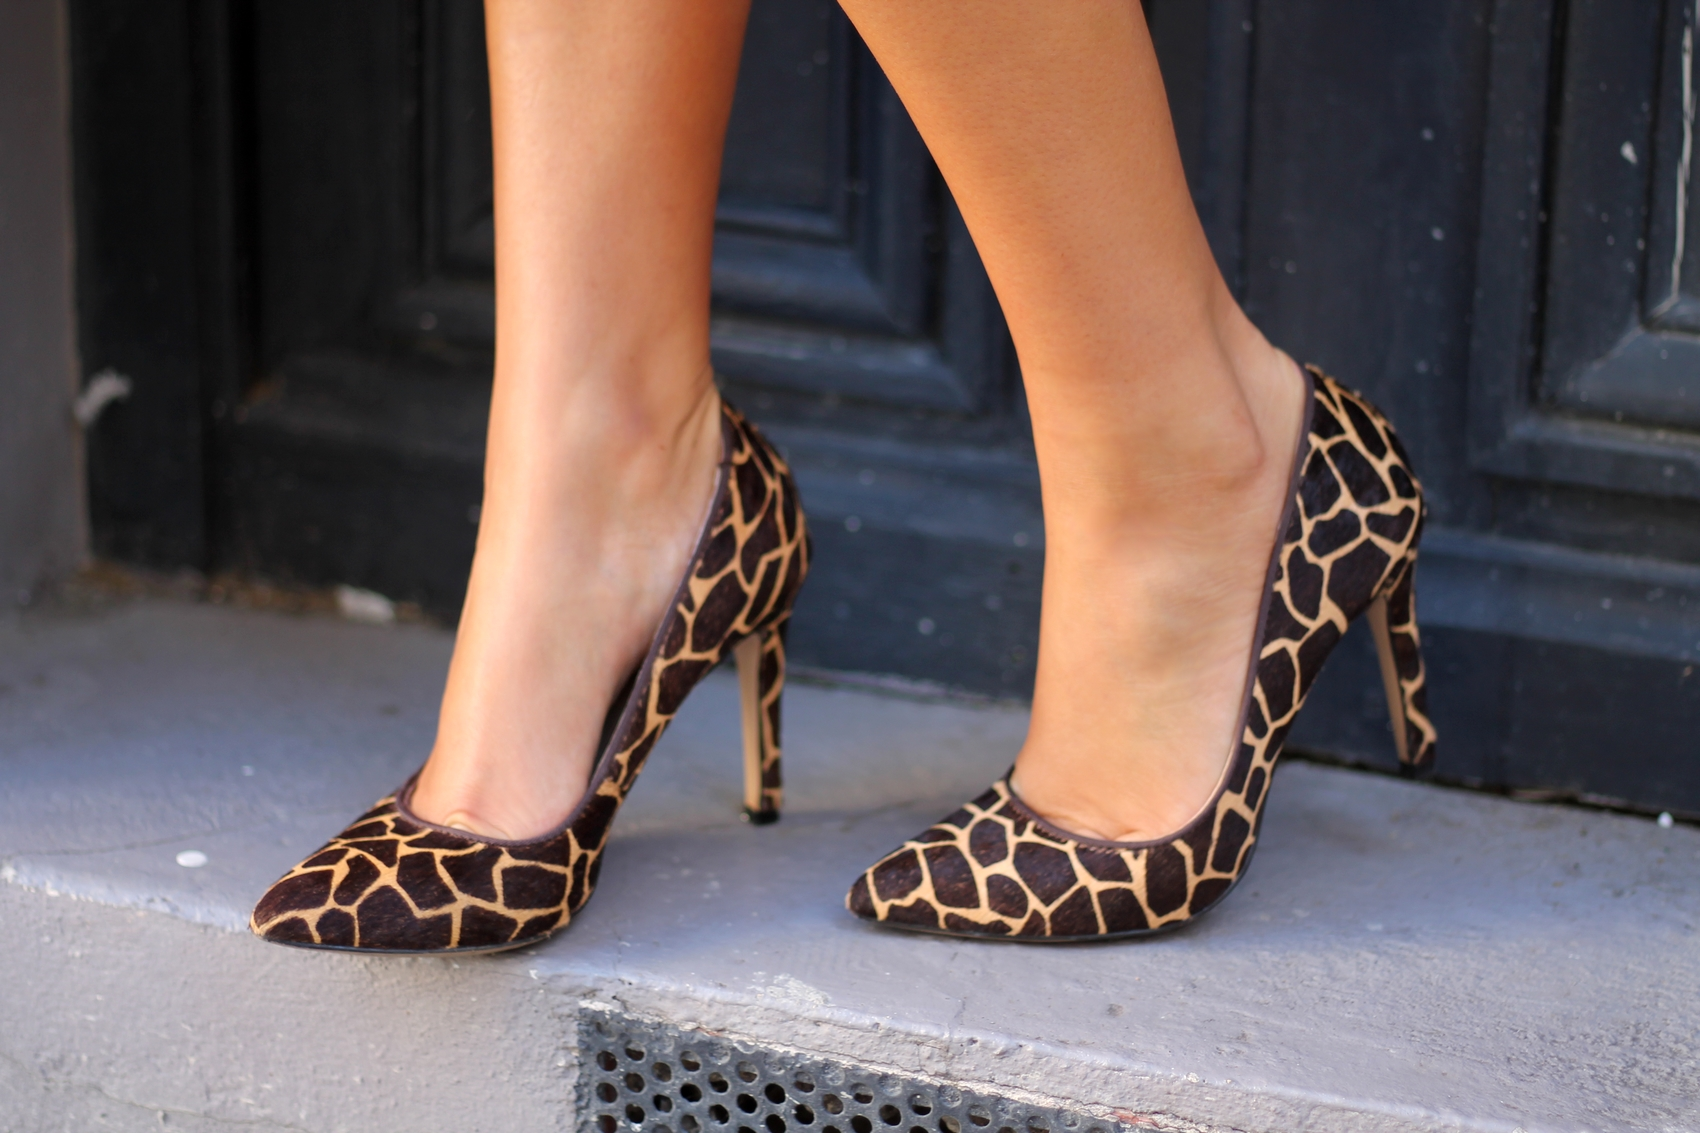 escarpins pointu imprimé animal girafe bata blog mode